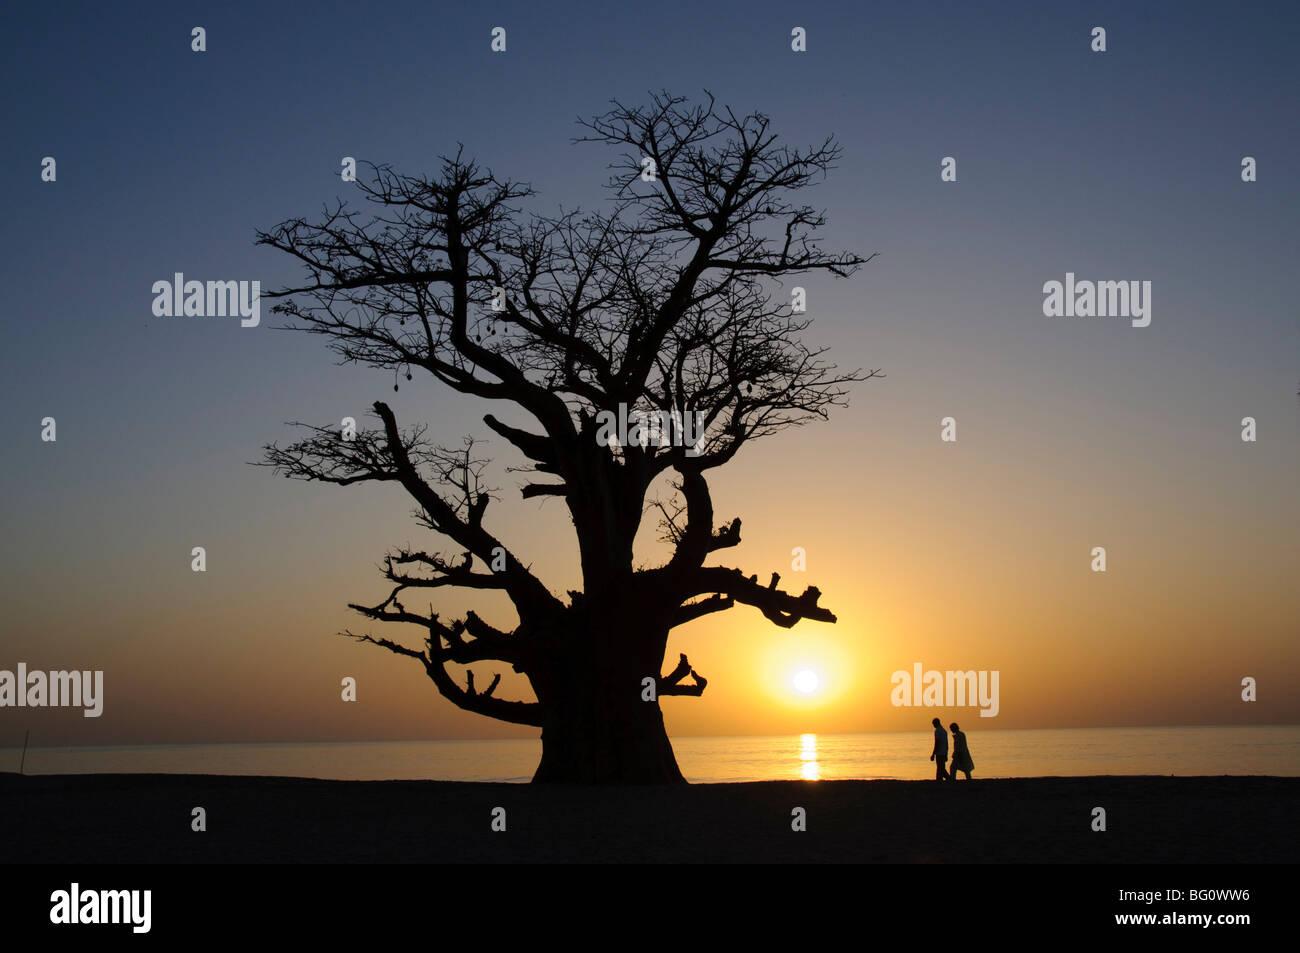 Baobab e giovane a piedi, Sine Saloum Delta, Senegal, Africa occidentale, Africa Immagini Stock